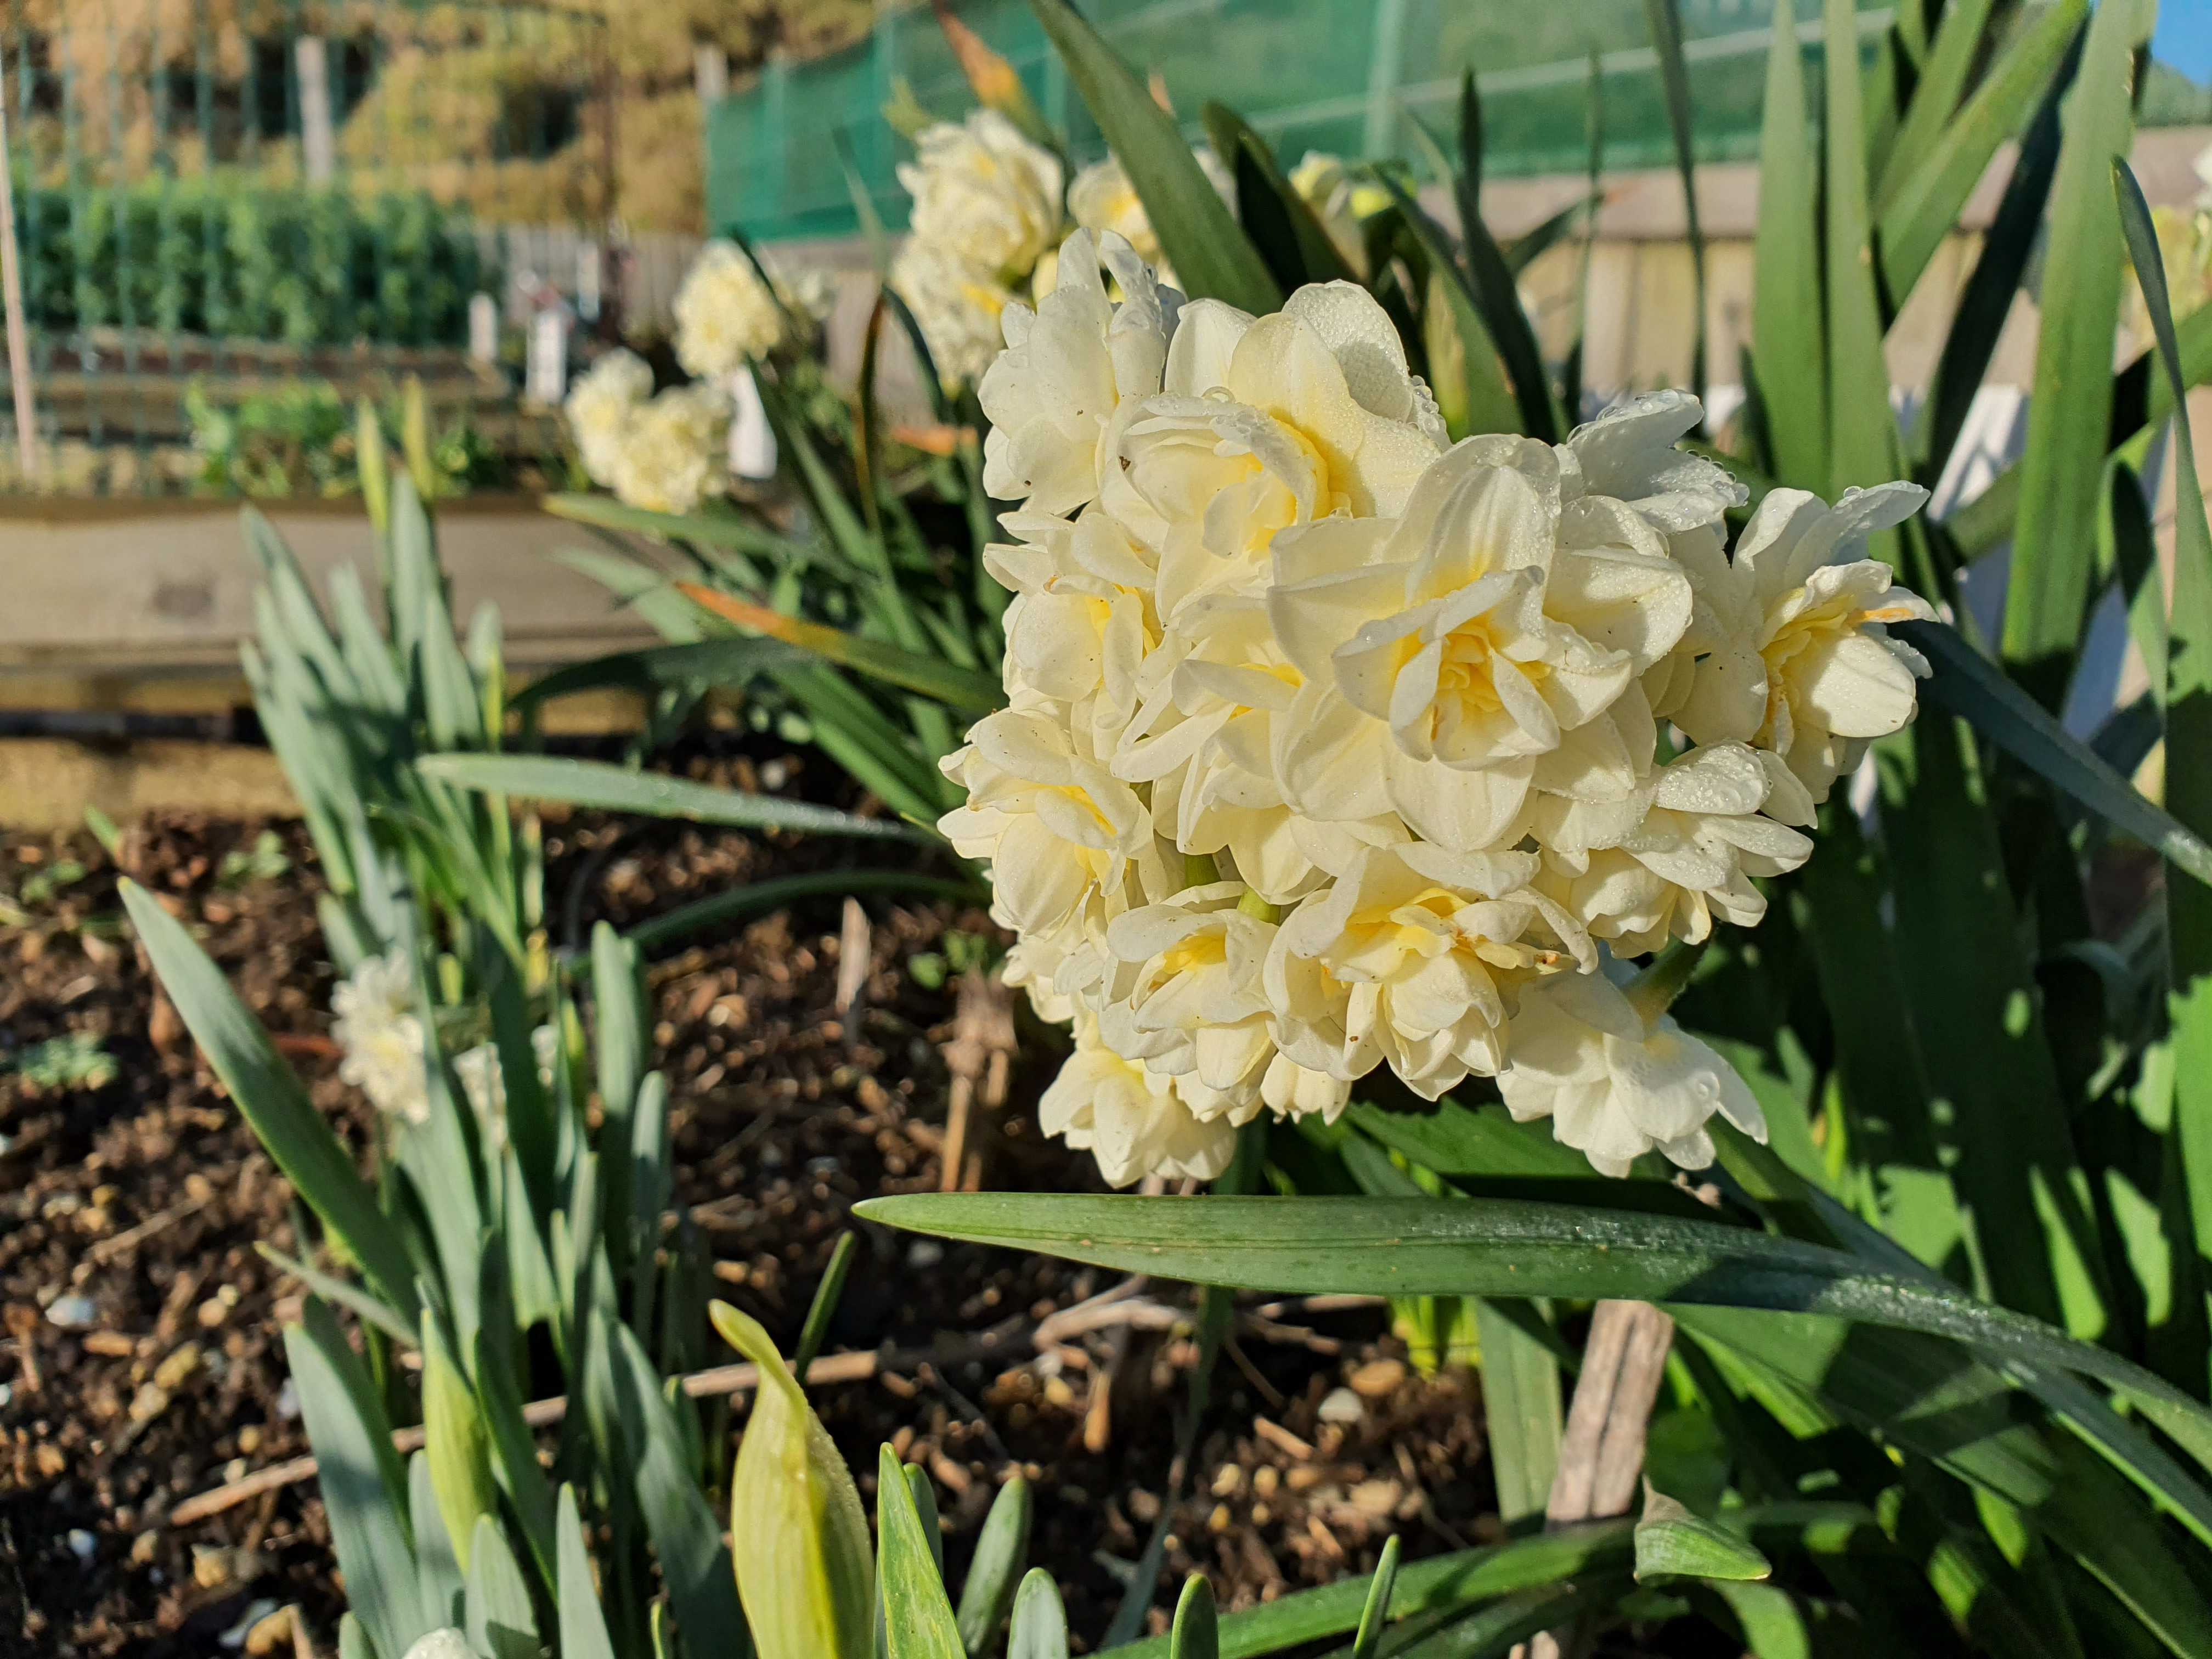 Earlicheer Daffodils